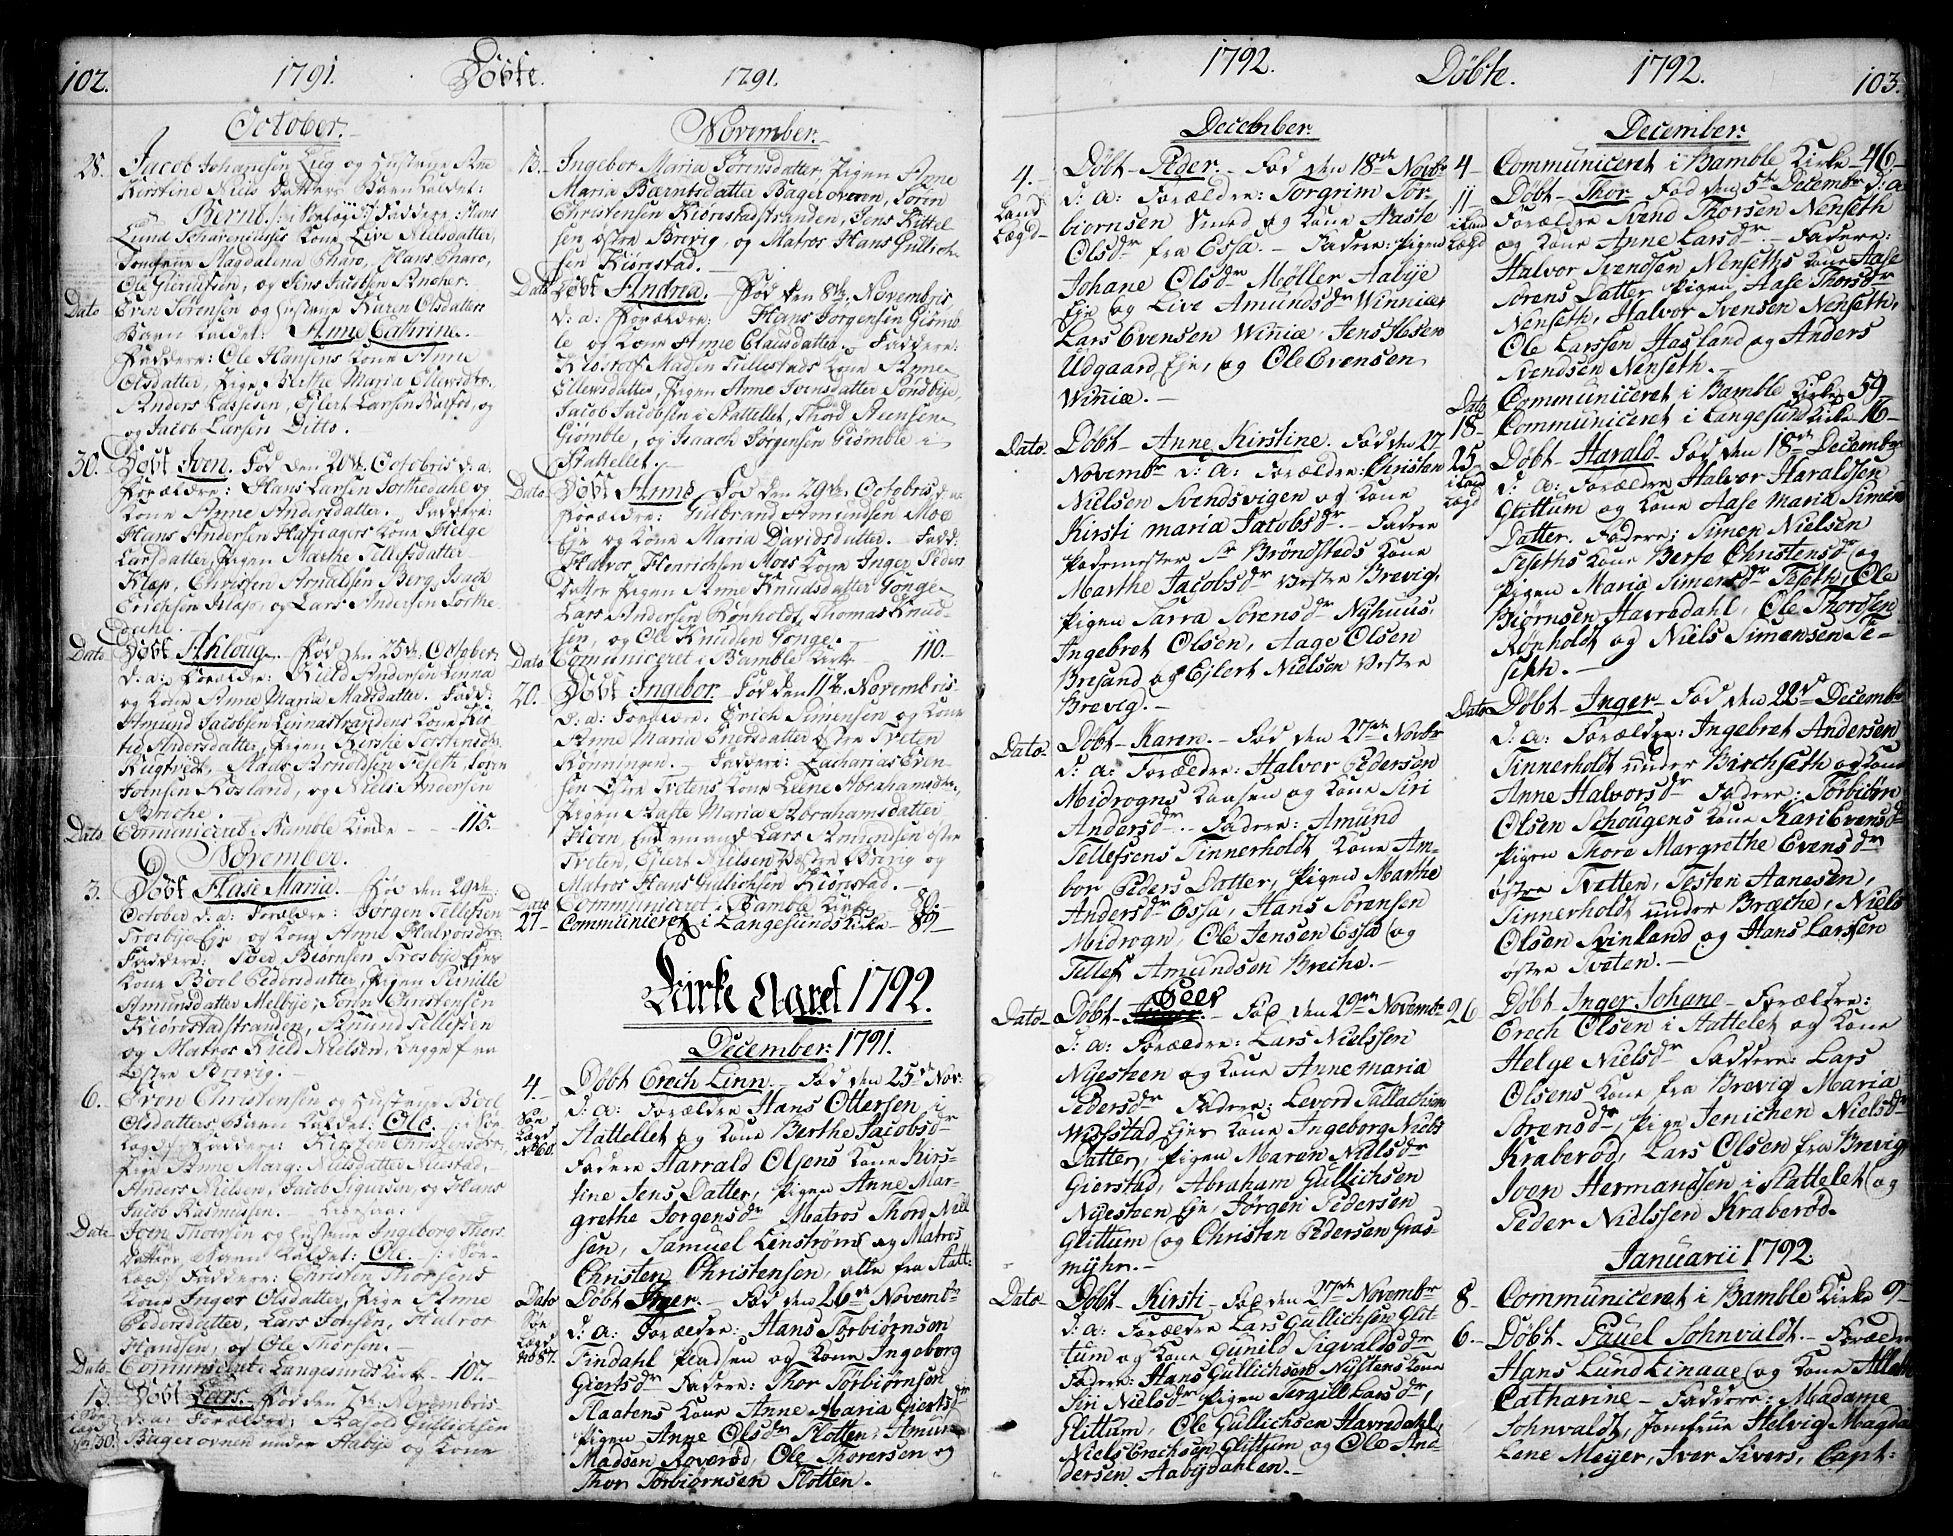 SAKO, Bamble kirkebøker, F/Fa/L0002: Ministerialbok nr. I 2, 1775-1814, s. 102-103